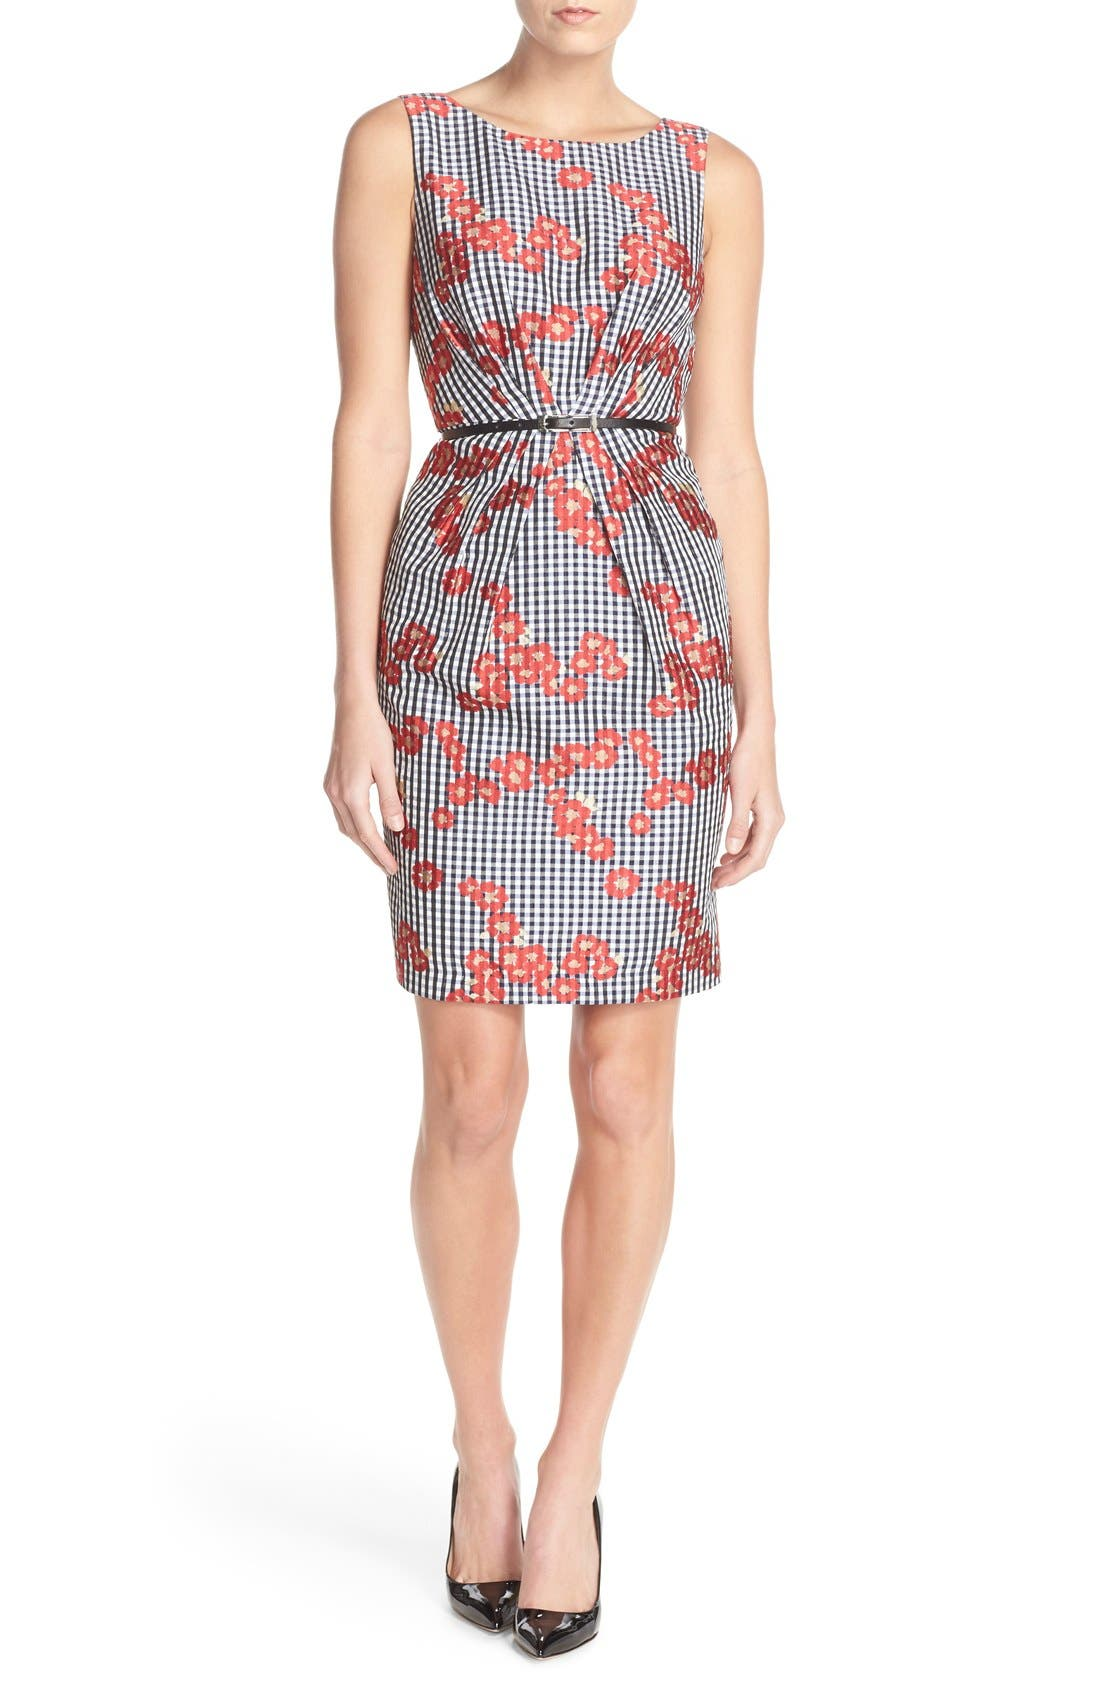 Main Image - Adrianna Papell Floral & Gingham Jacquard Sheath Dress (Regular & Petite)